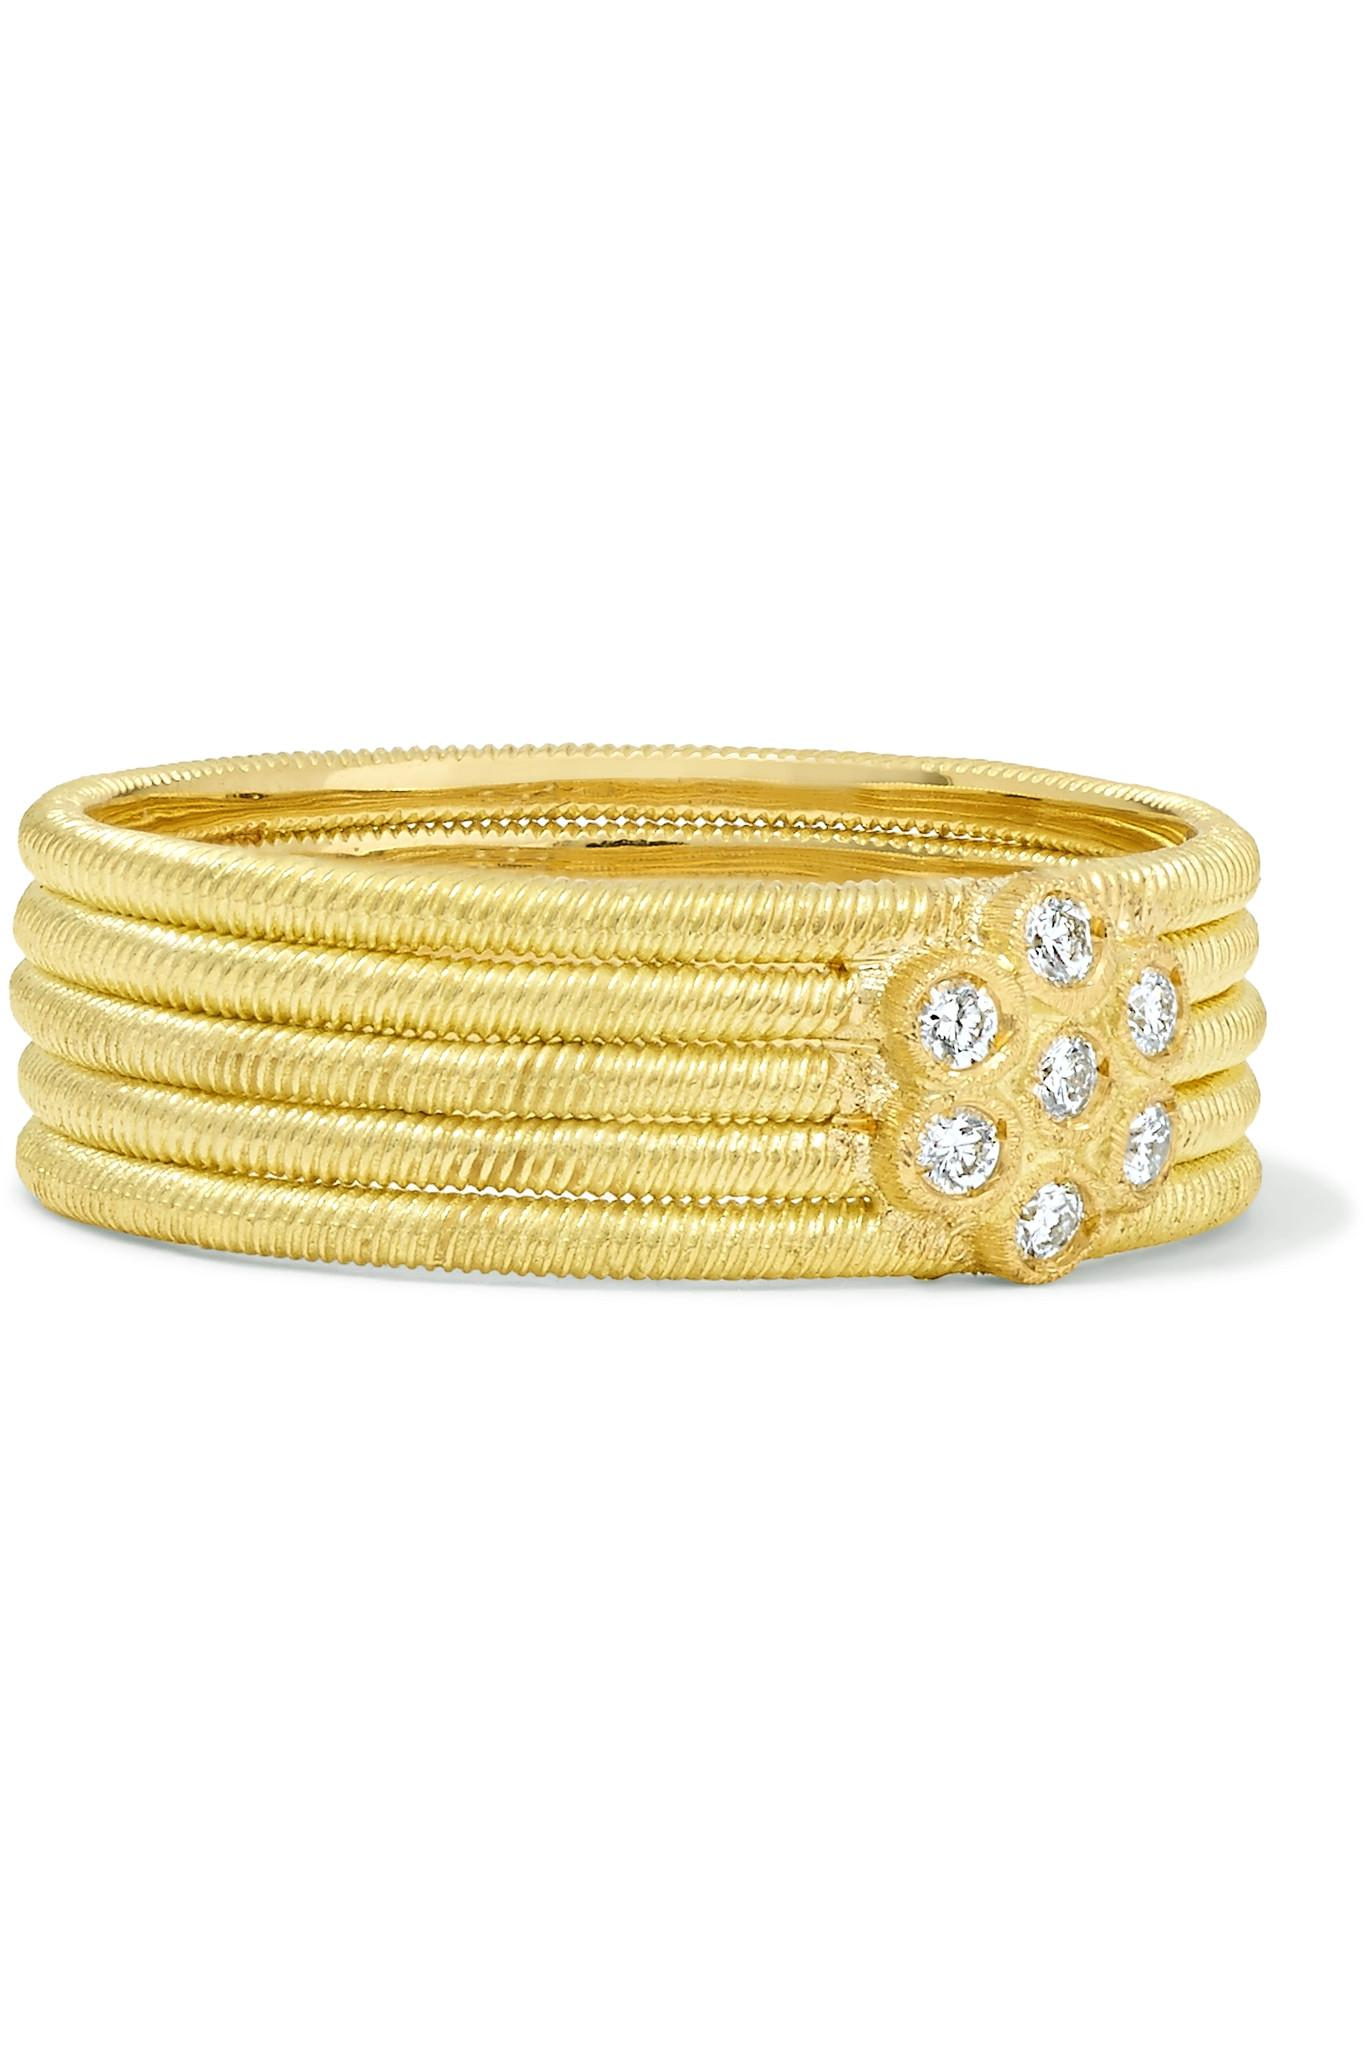 Buccellati Hawaii 18-karat Yellow And White Gold Diamond Ring xzpQPHtlL